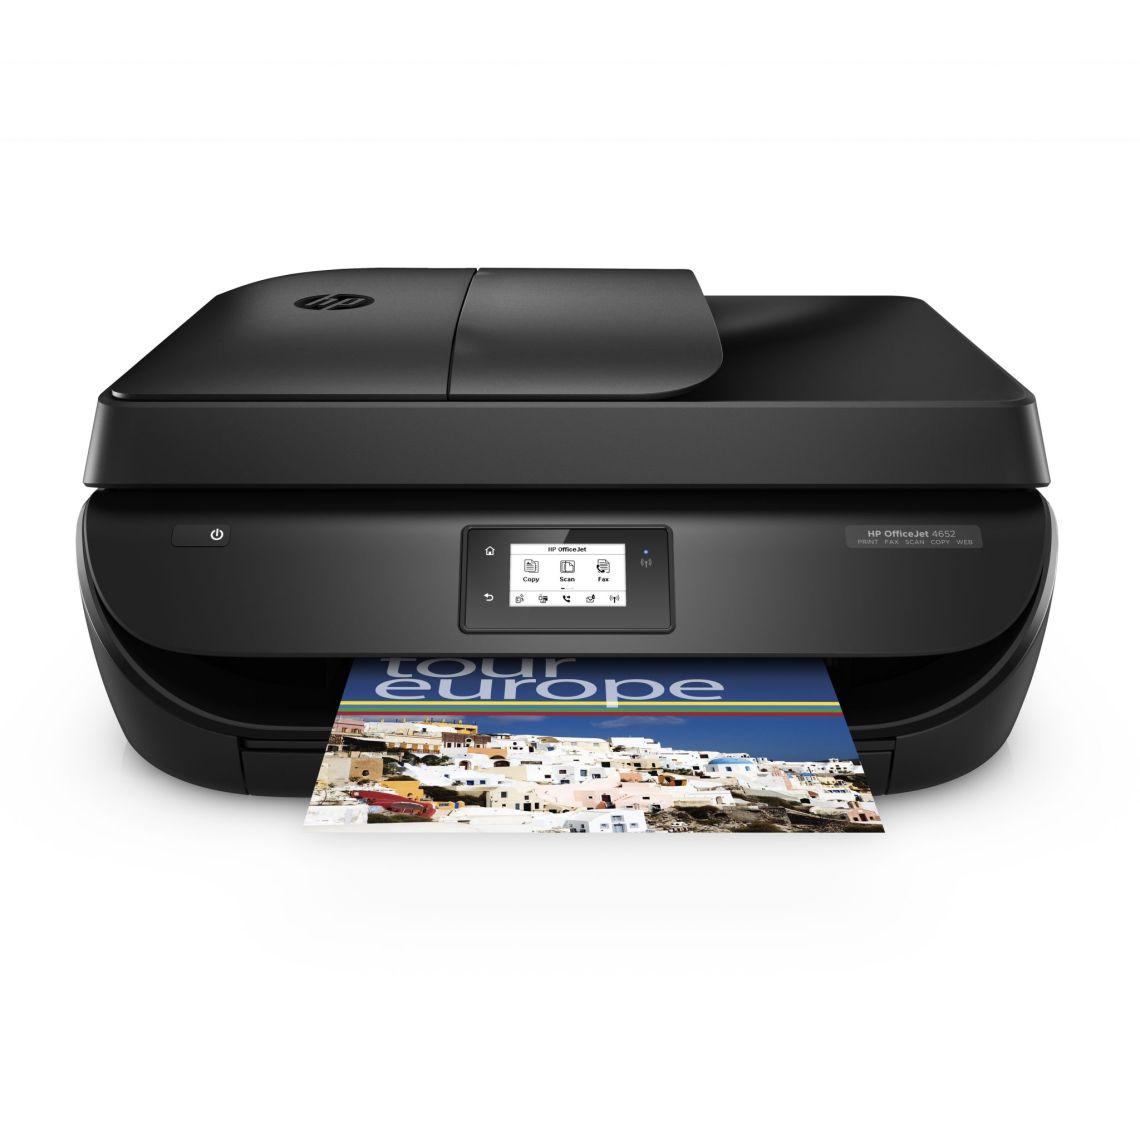 HP Officejet 4652 All-in-One Printer/Copier/Scanner - Walmart.com